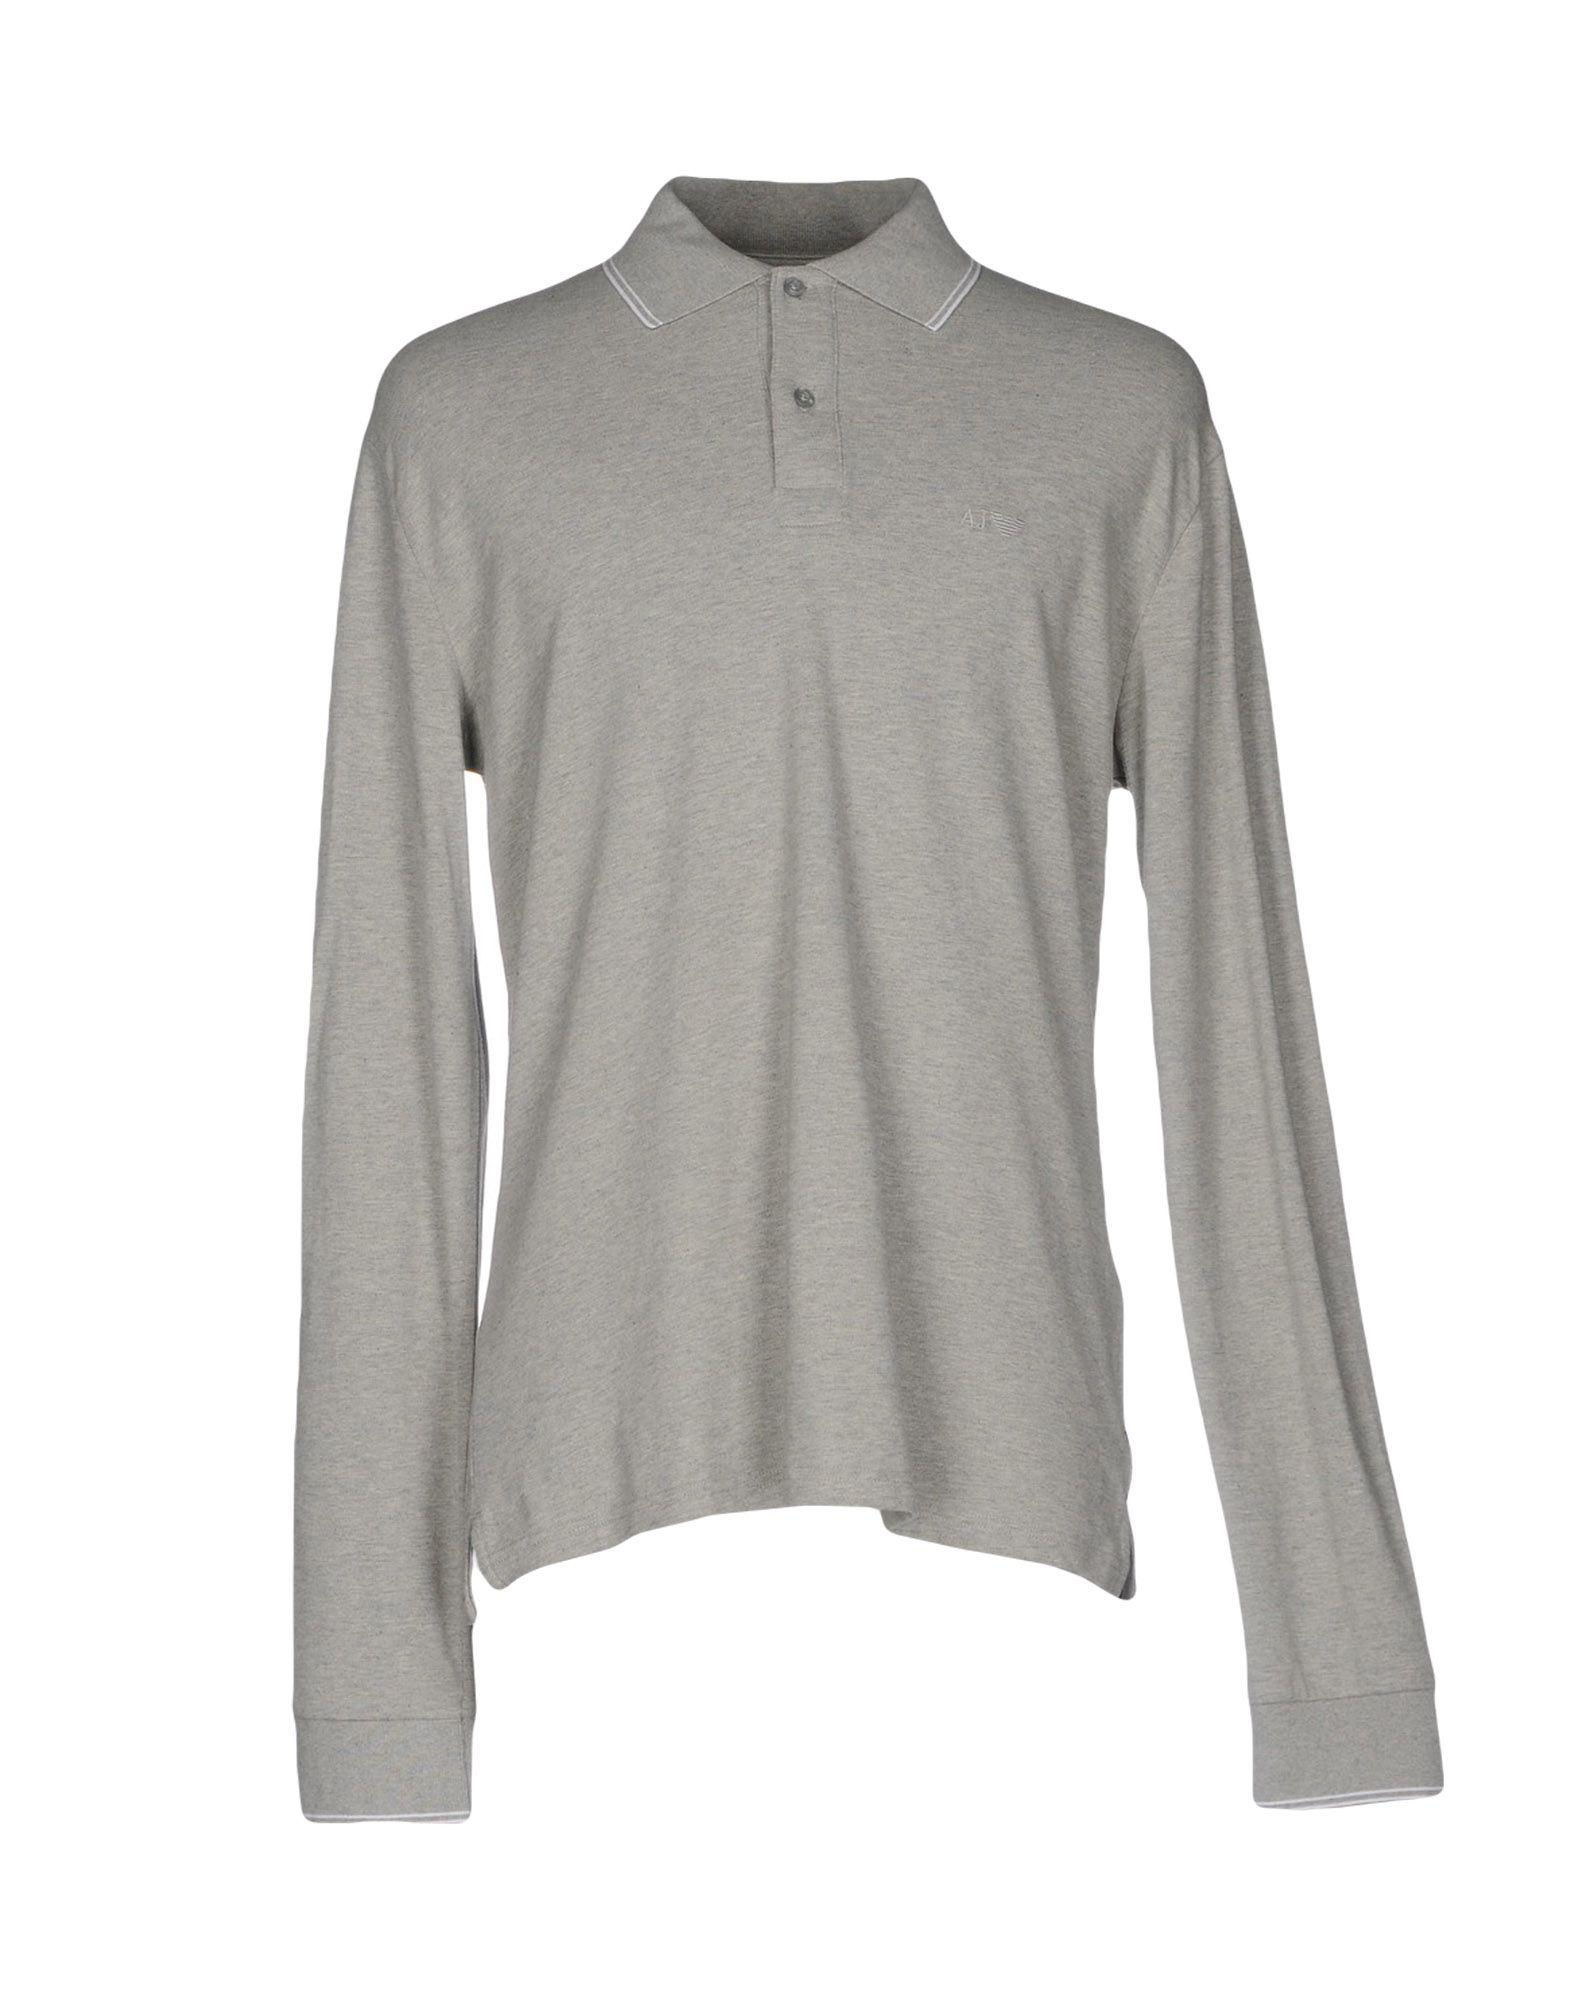 Shirt Armani Polo Dreamworks Light Grey Jeans Long Sleeve orBCxdeW